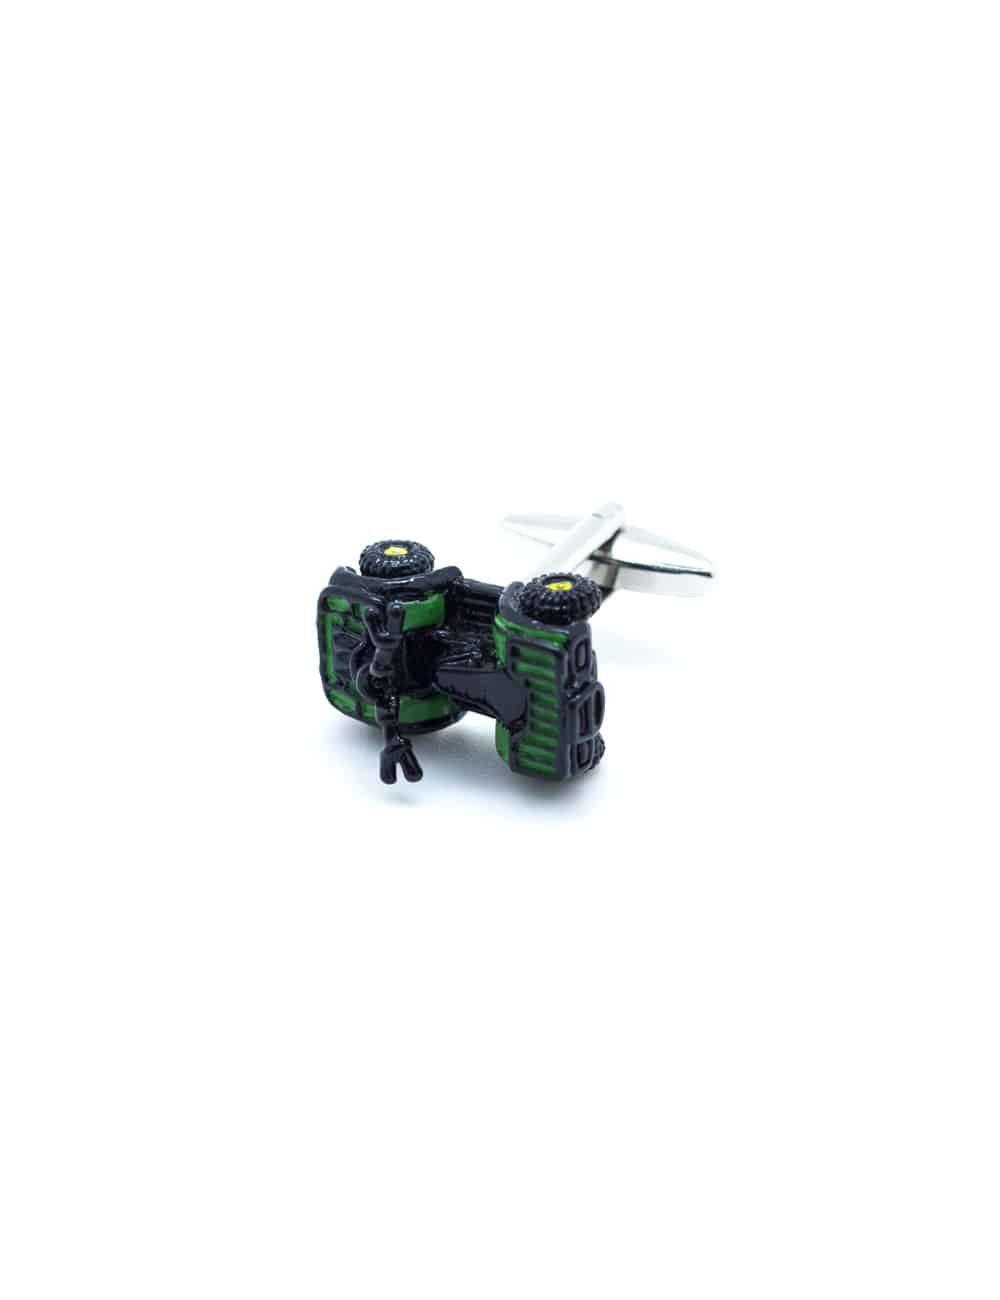 Green 4 wheeled quad bike cufflink 0114-012